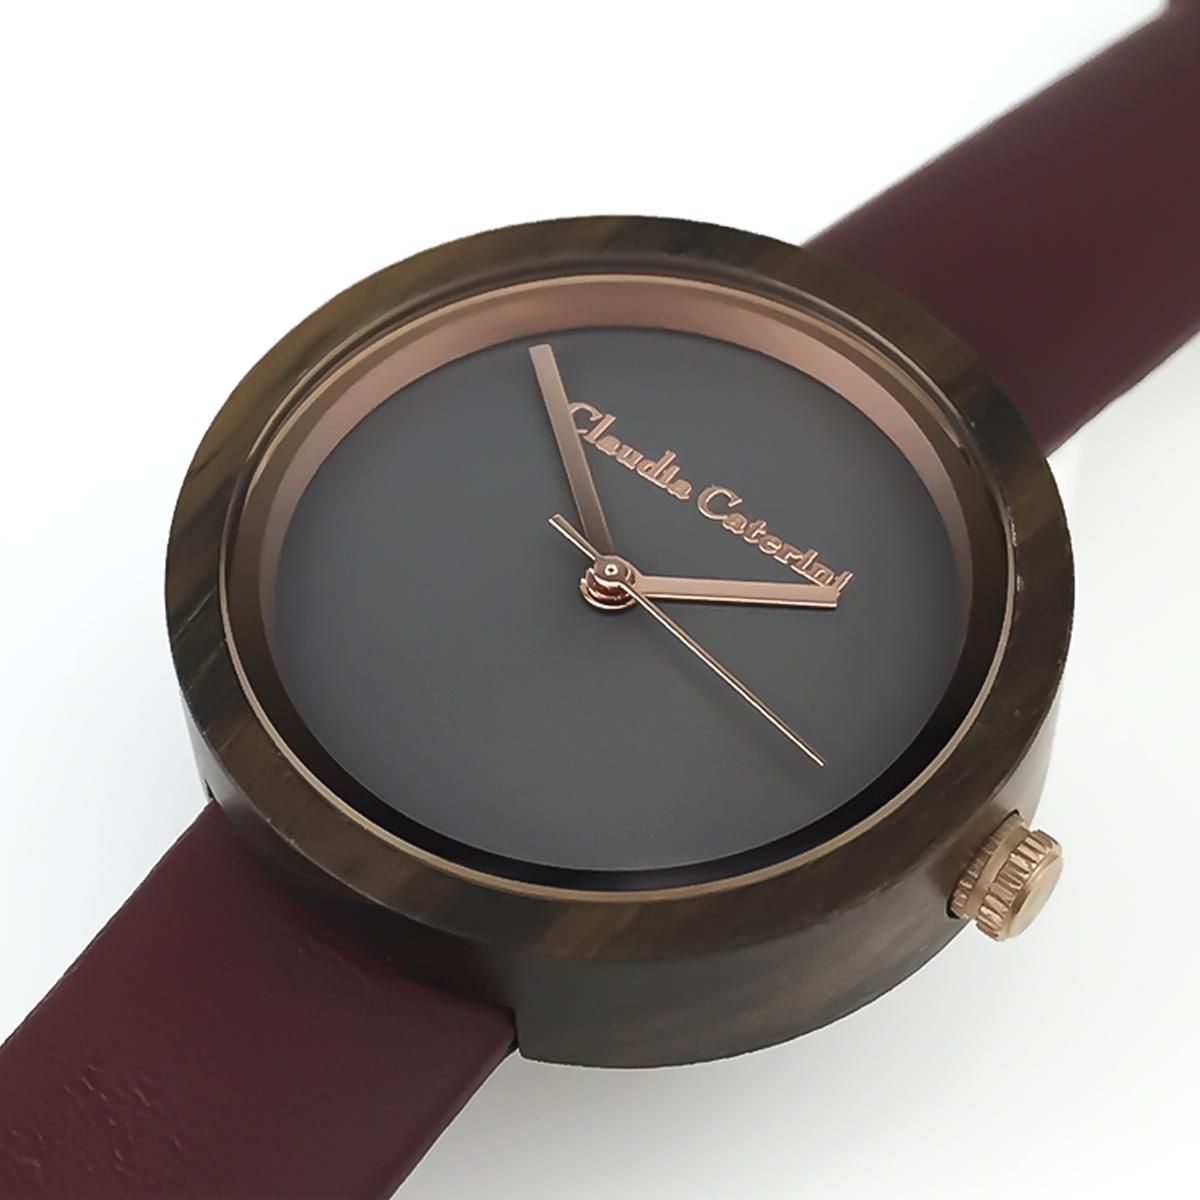 Claudia Caterini クラウディアカテリーニ ウッドウオッチ アナログウオッチ 腕時計 本革 レディース【CC-A116】